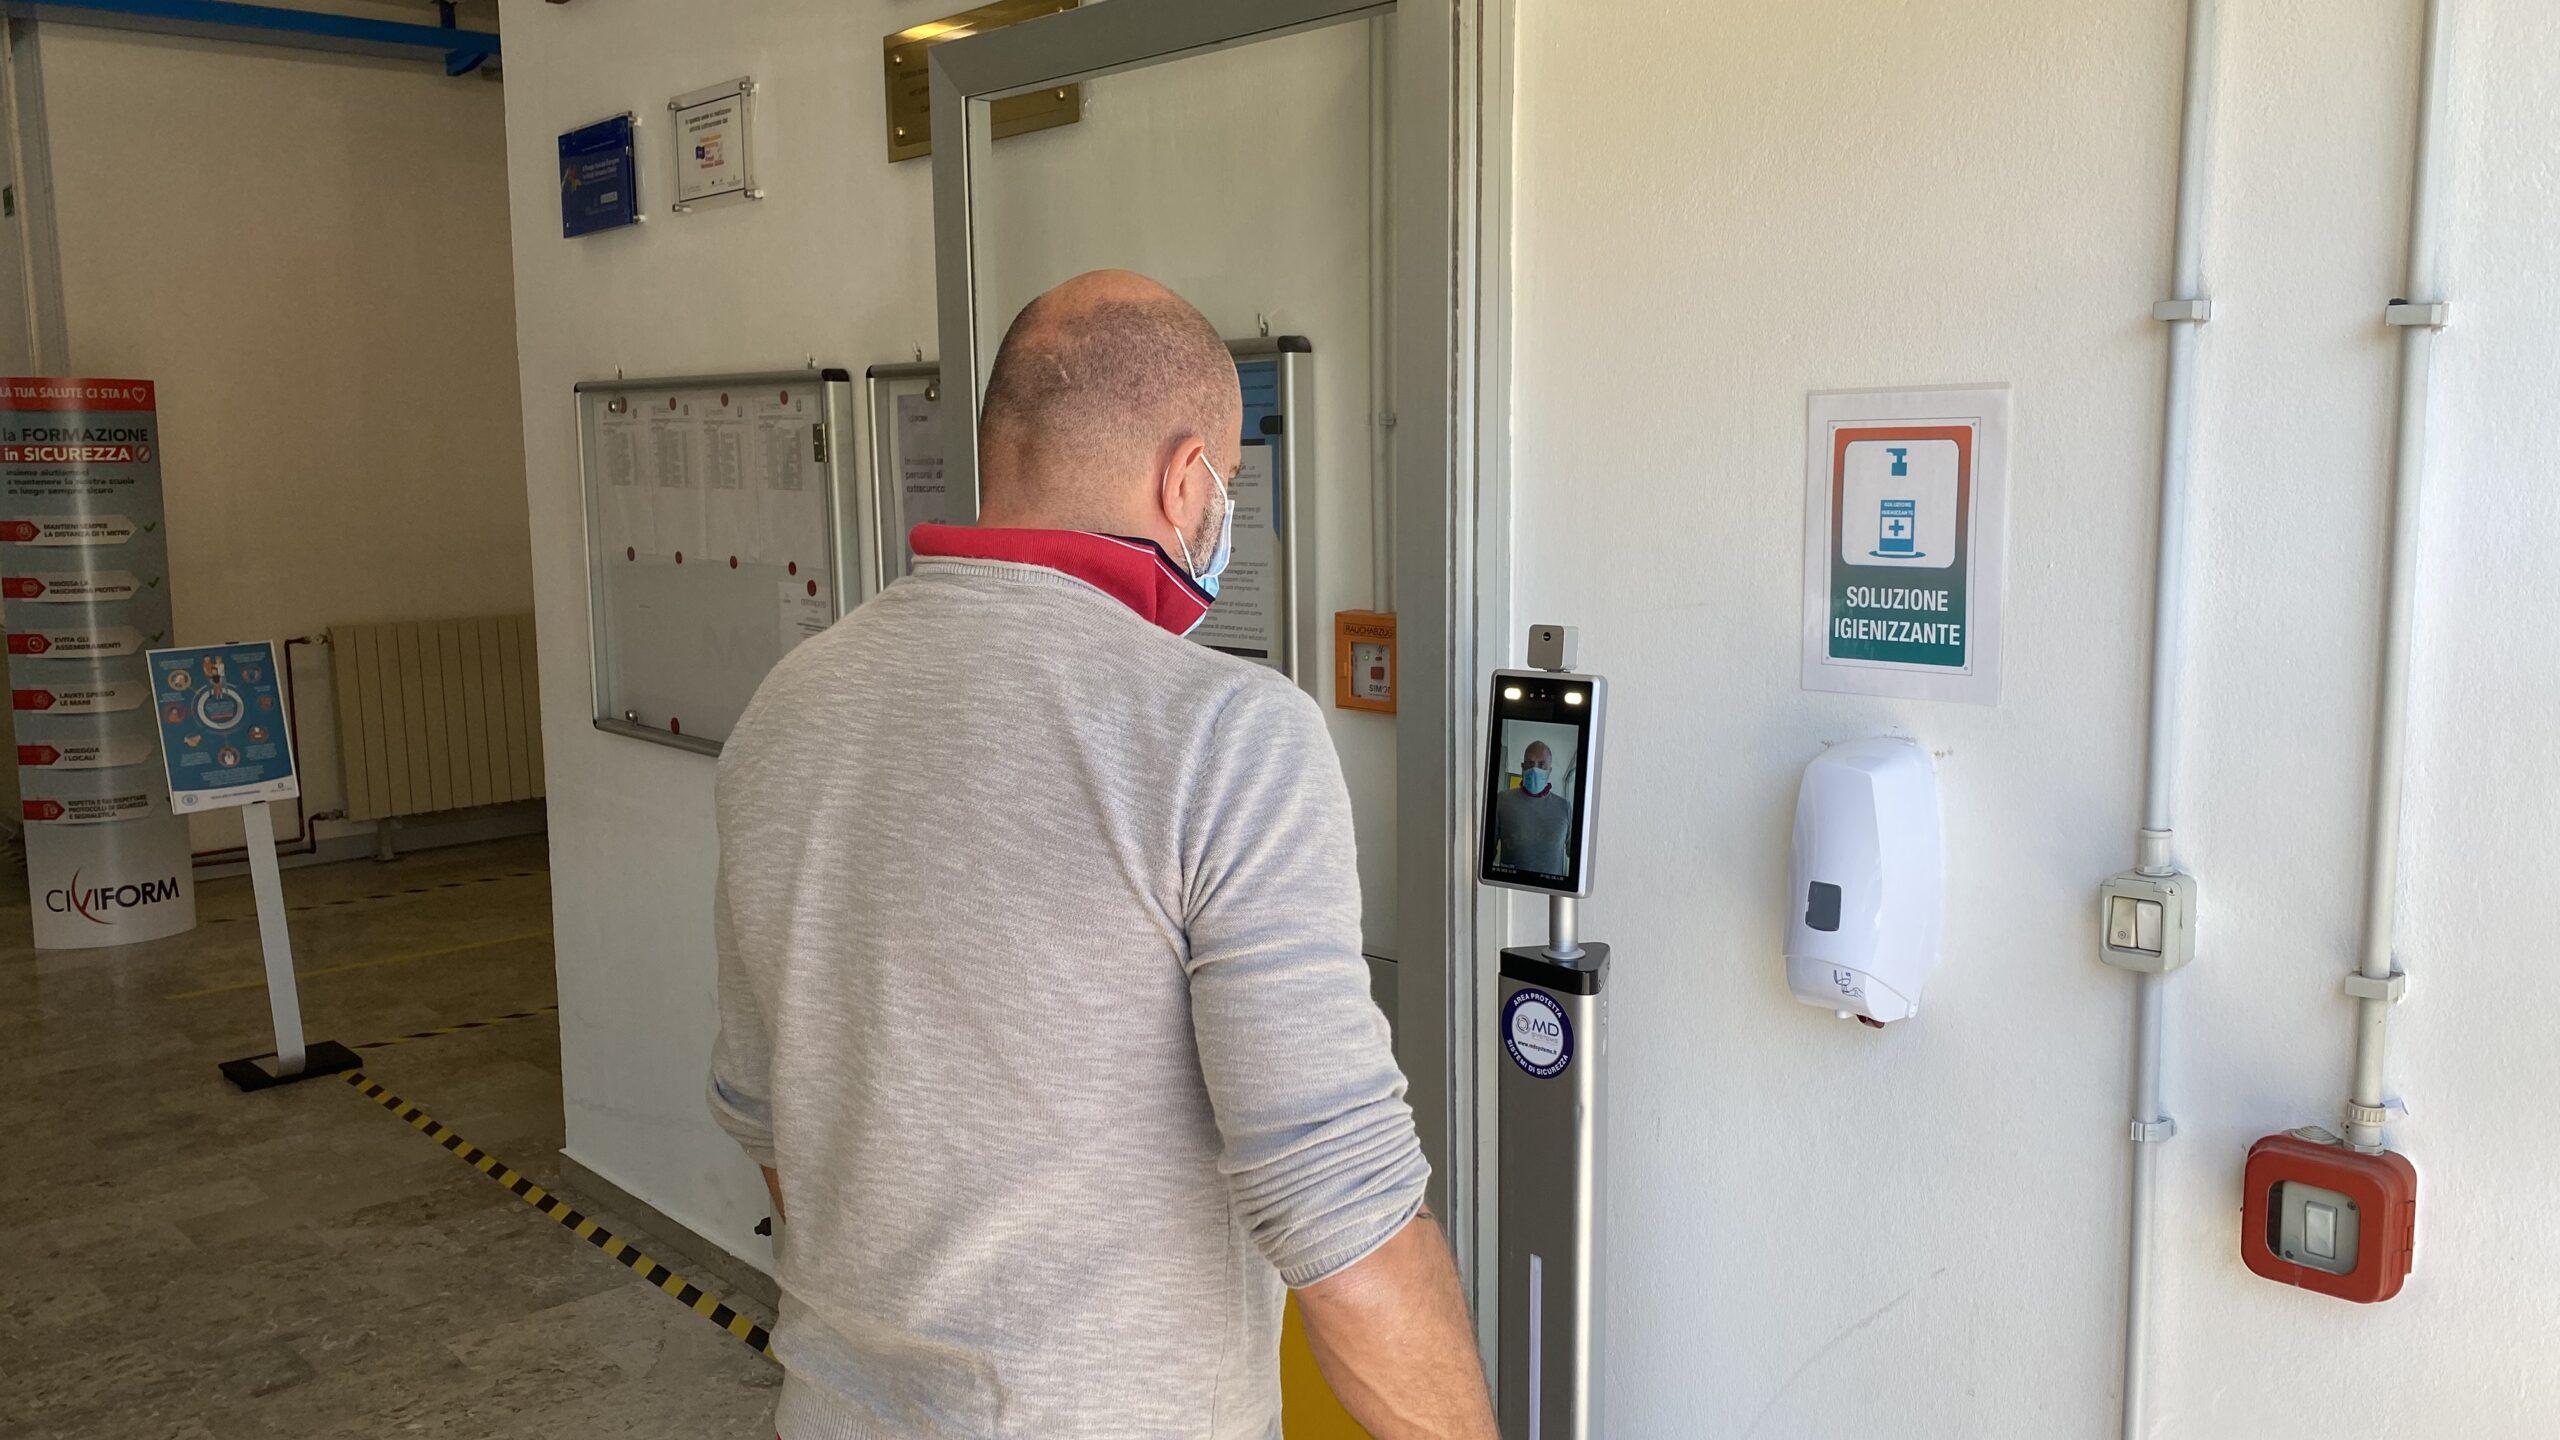 Controllo accessi termoscanner Civiform Trieste